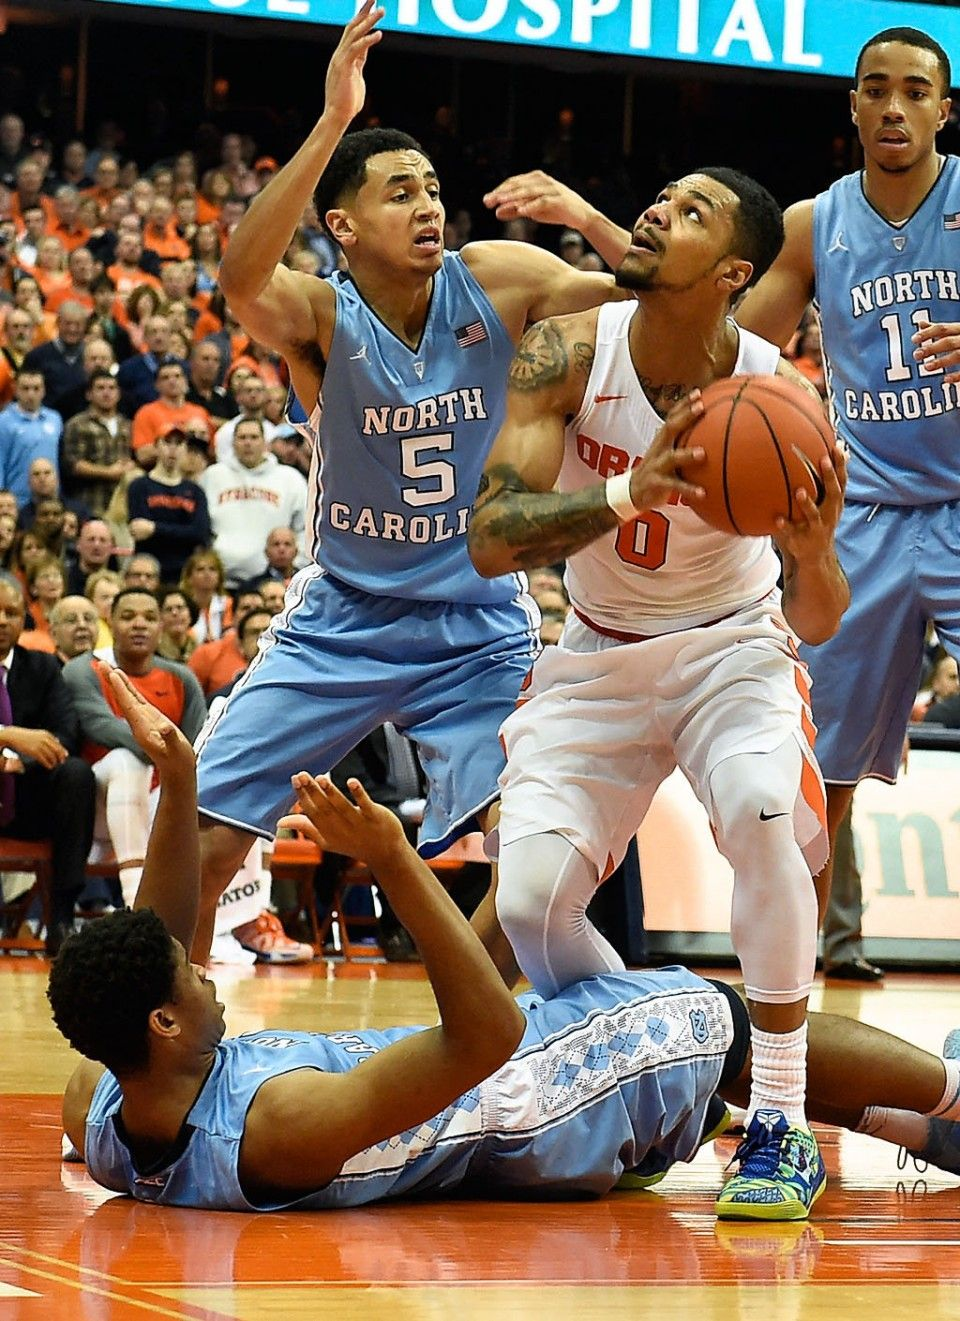 basketball vs. North Carolina 1/9/16 Syracuse basketball